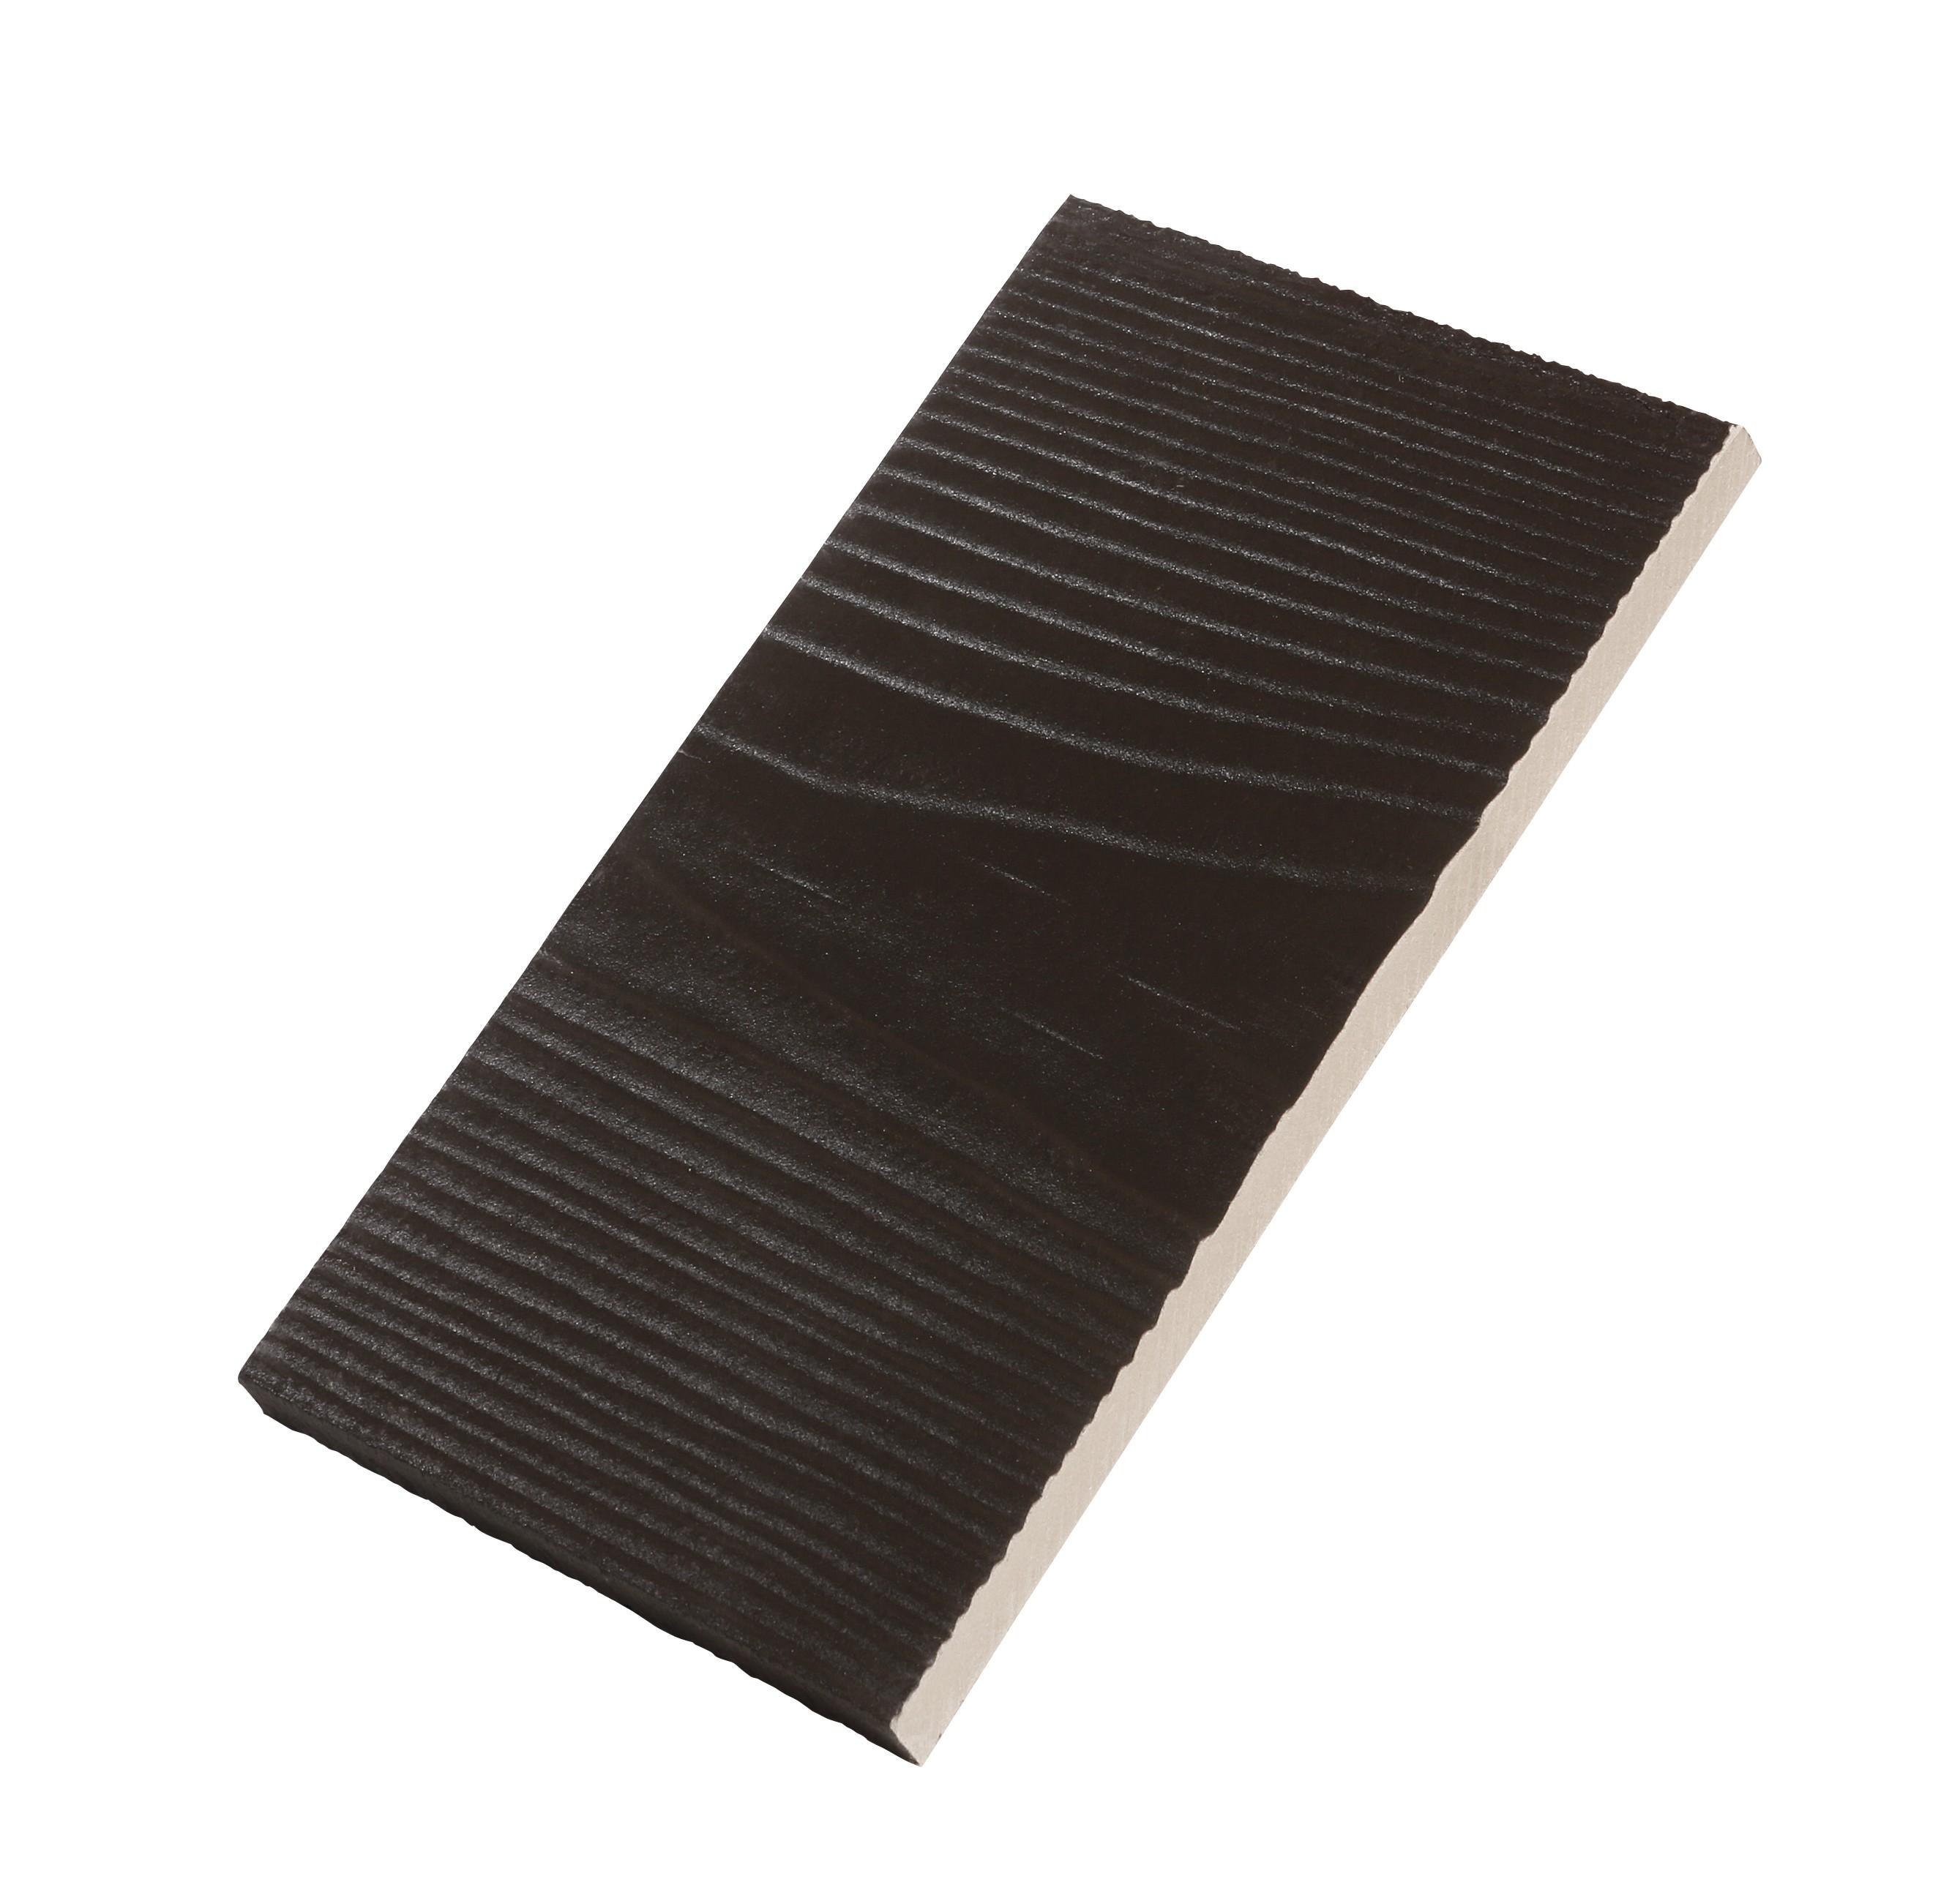 Cedral Click Weatherboard Cladding - Dark Brown